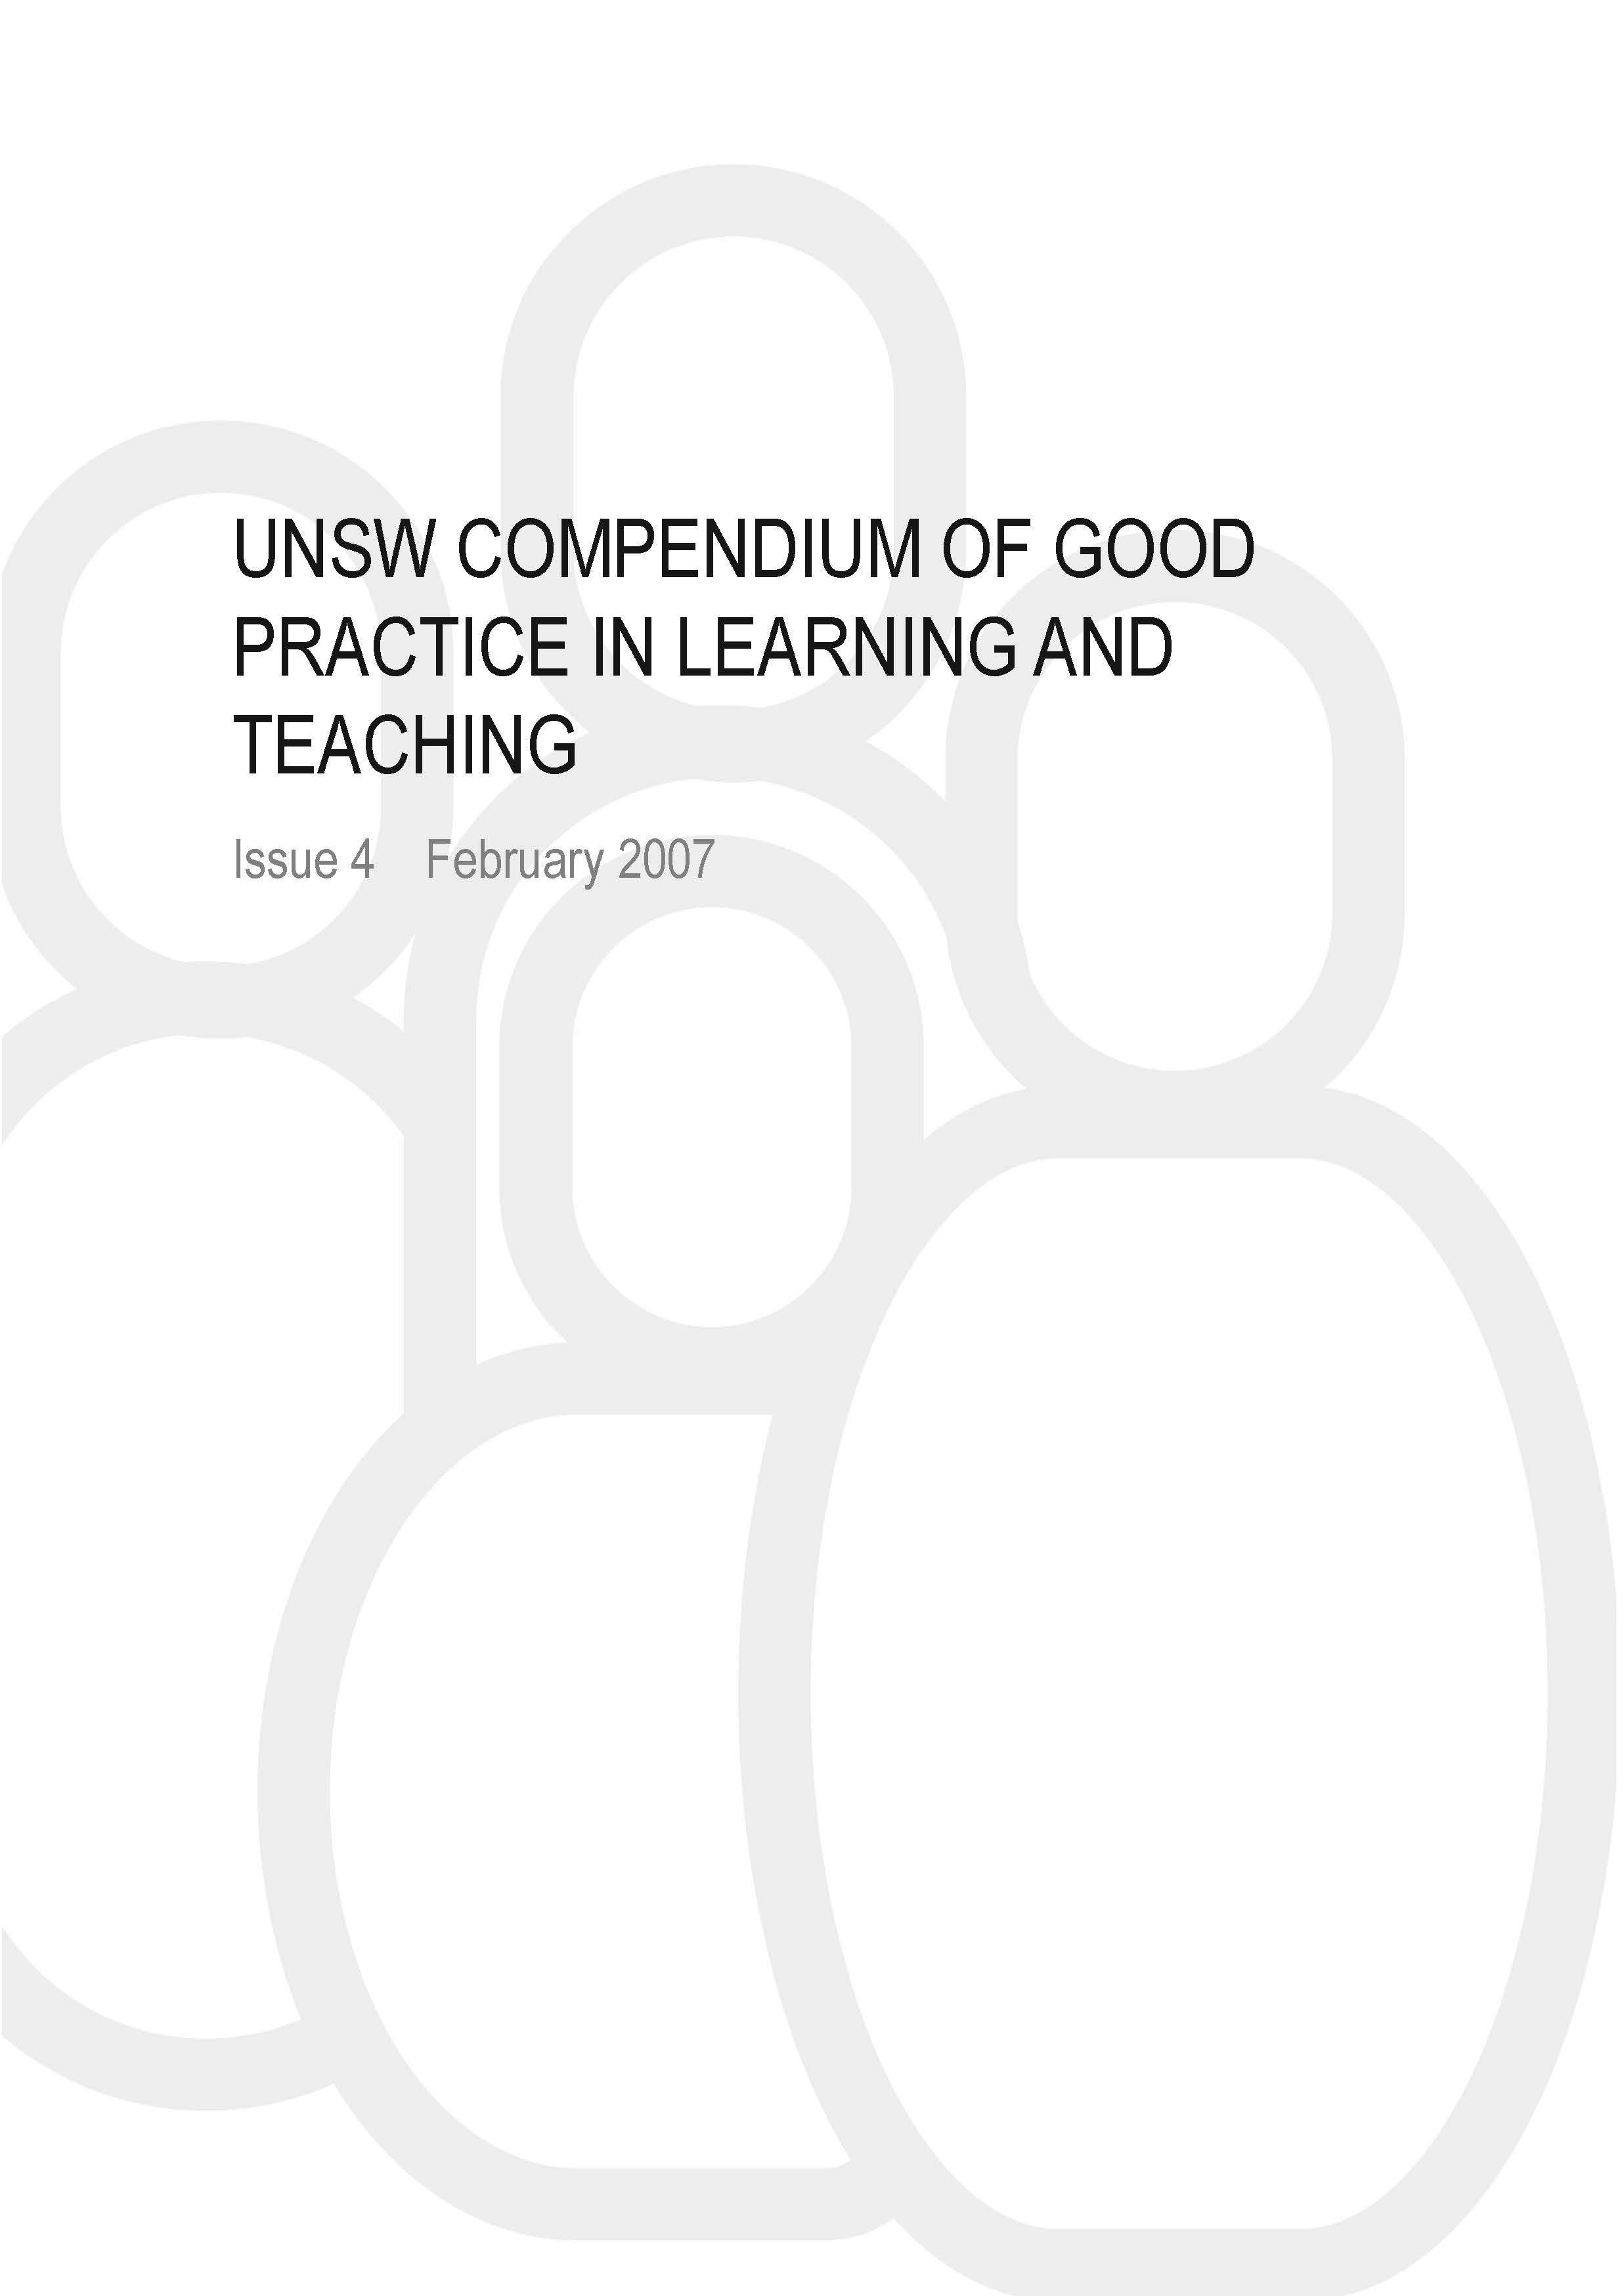 UNSW_Compendium_Issue4_Feb07_Page_1.jpg